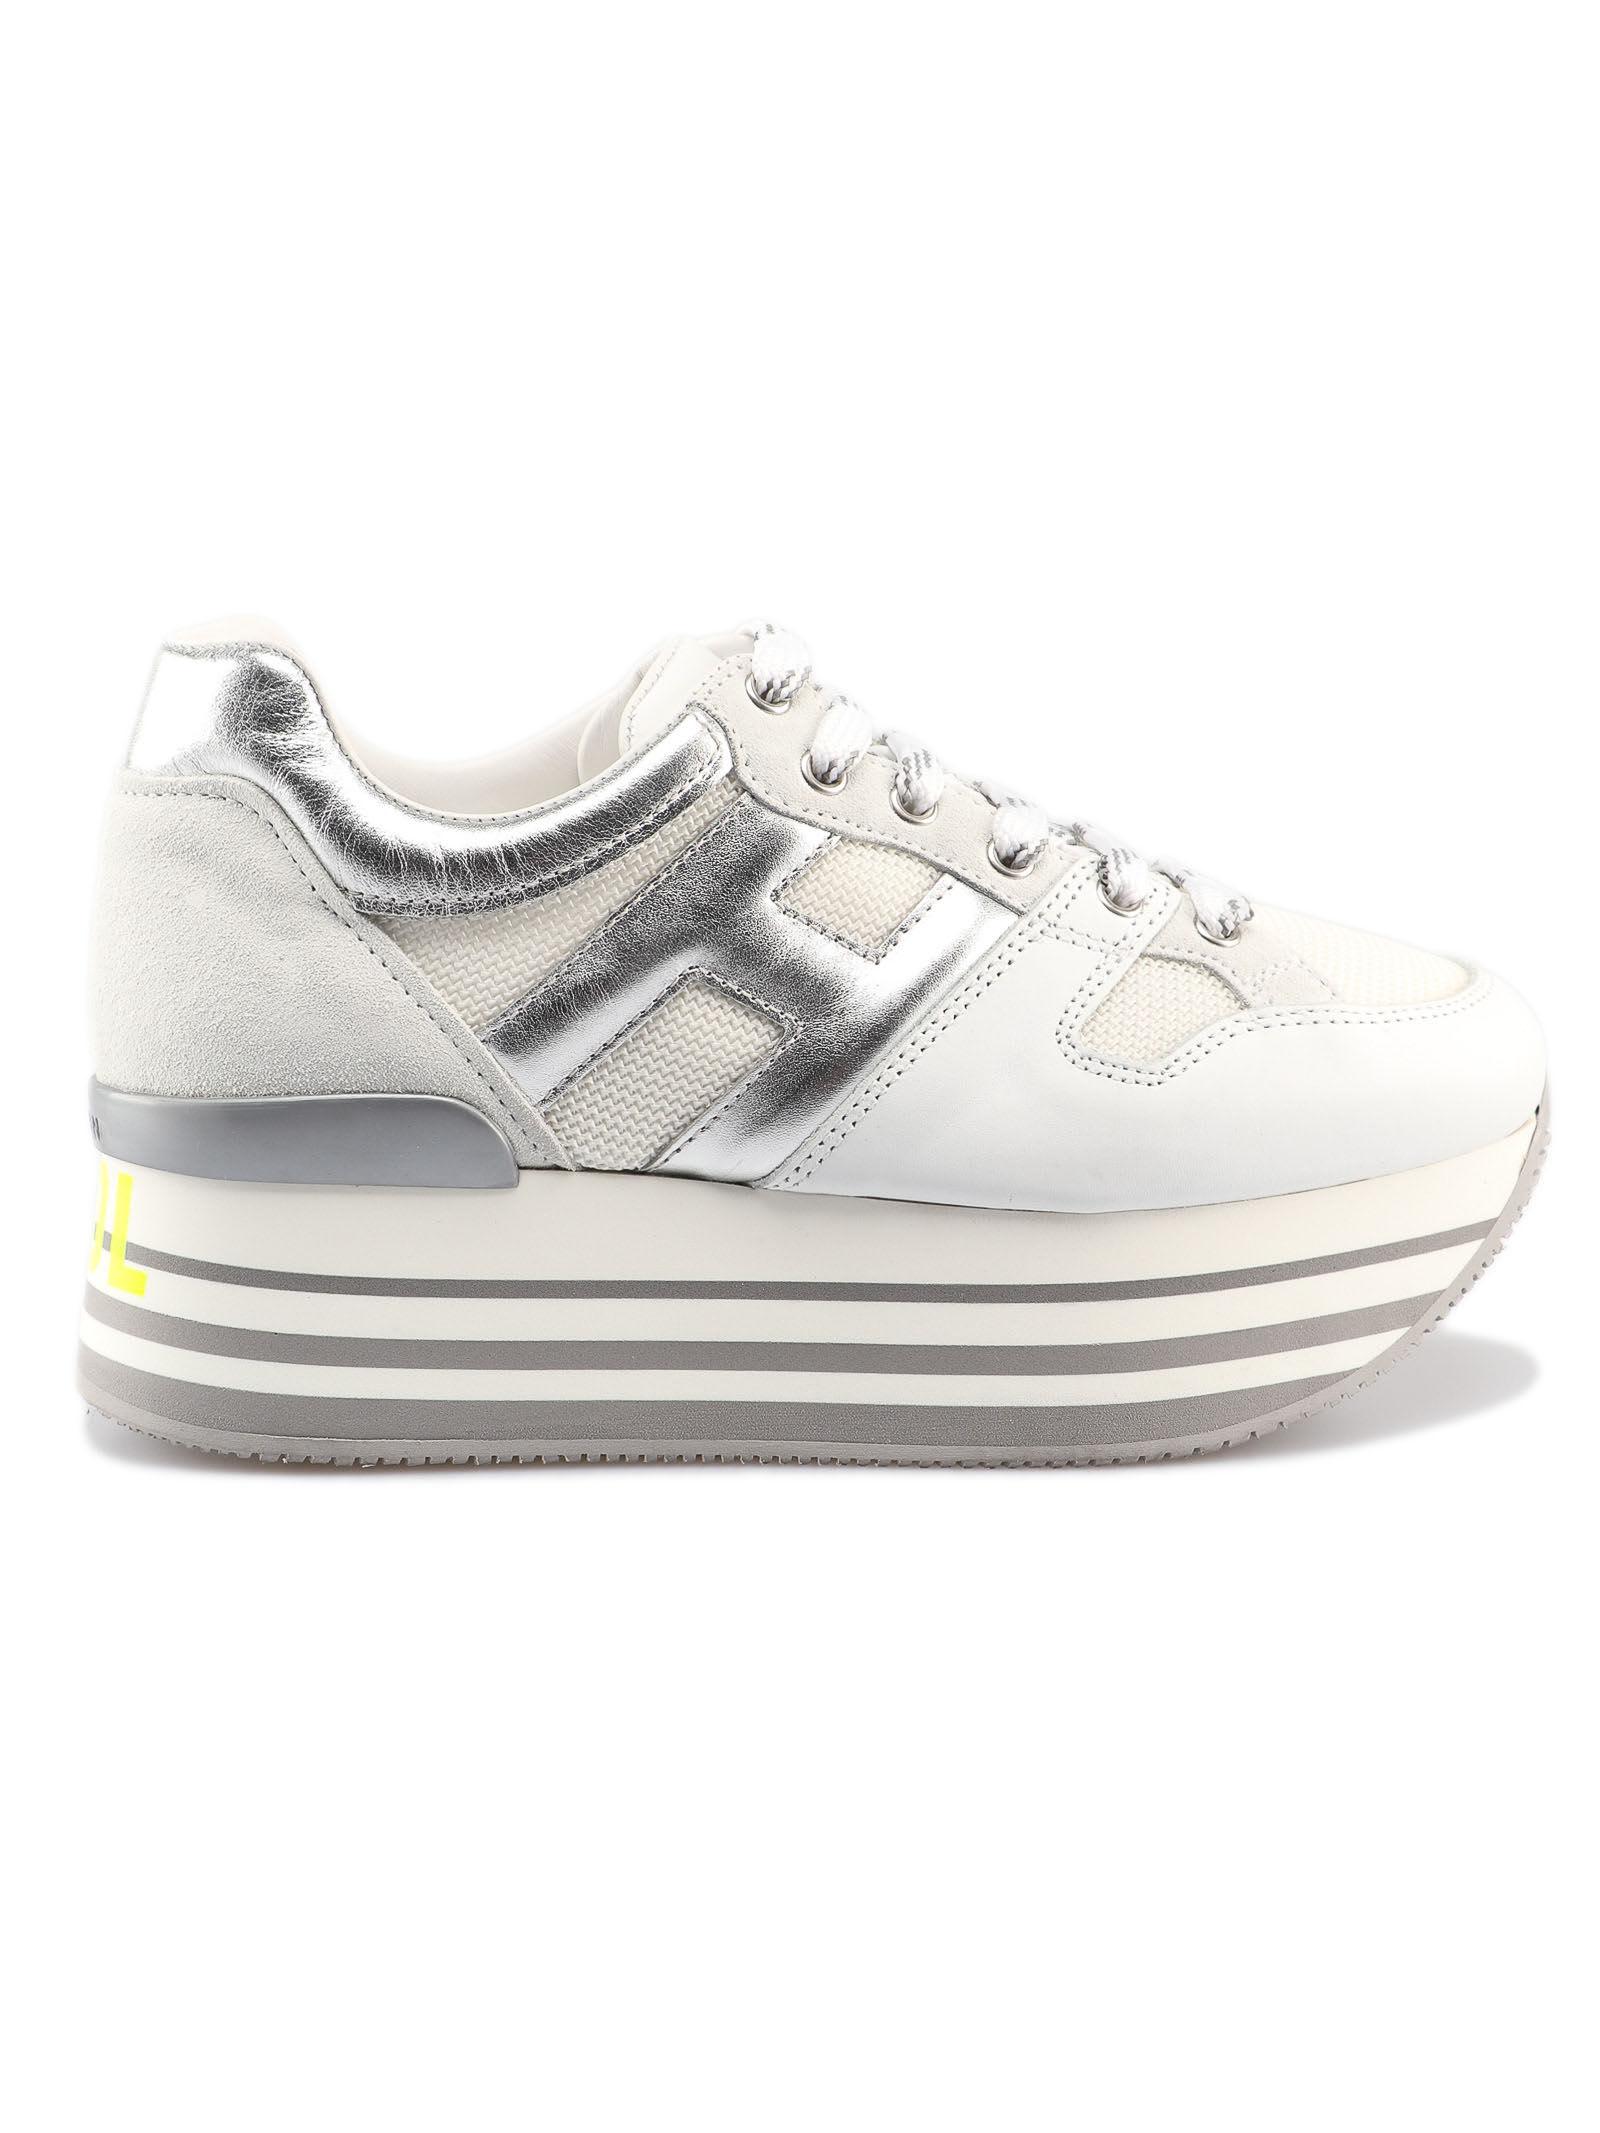 80ab5649 Hogan Hogan Max Stay Cool Platform Sneakers - Bianco Argento ...